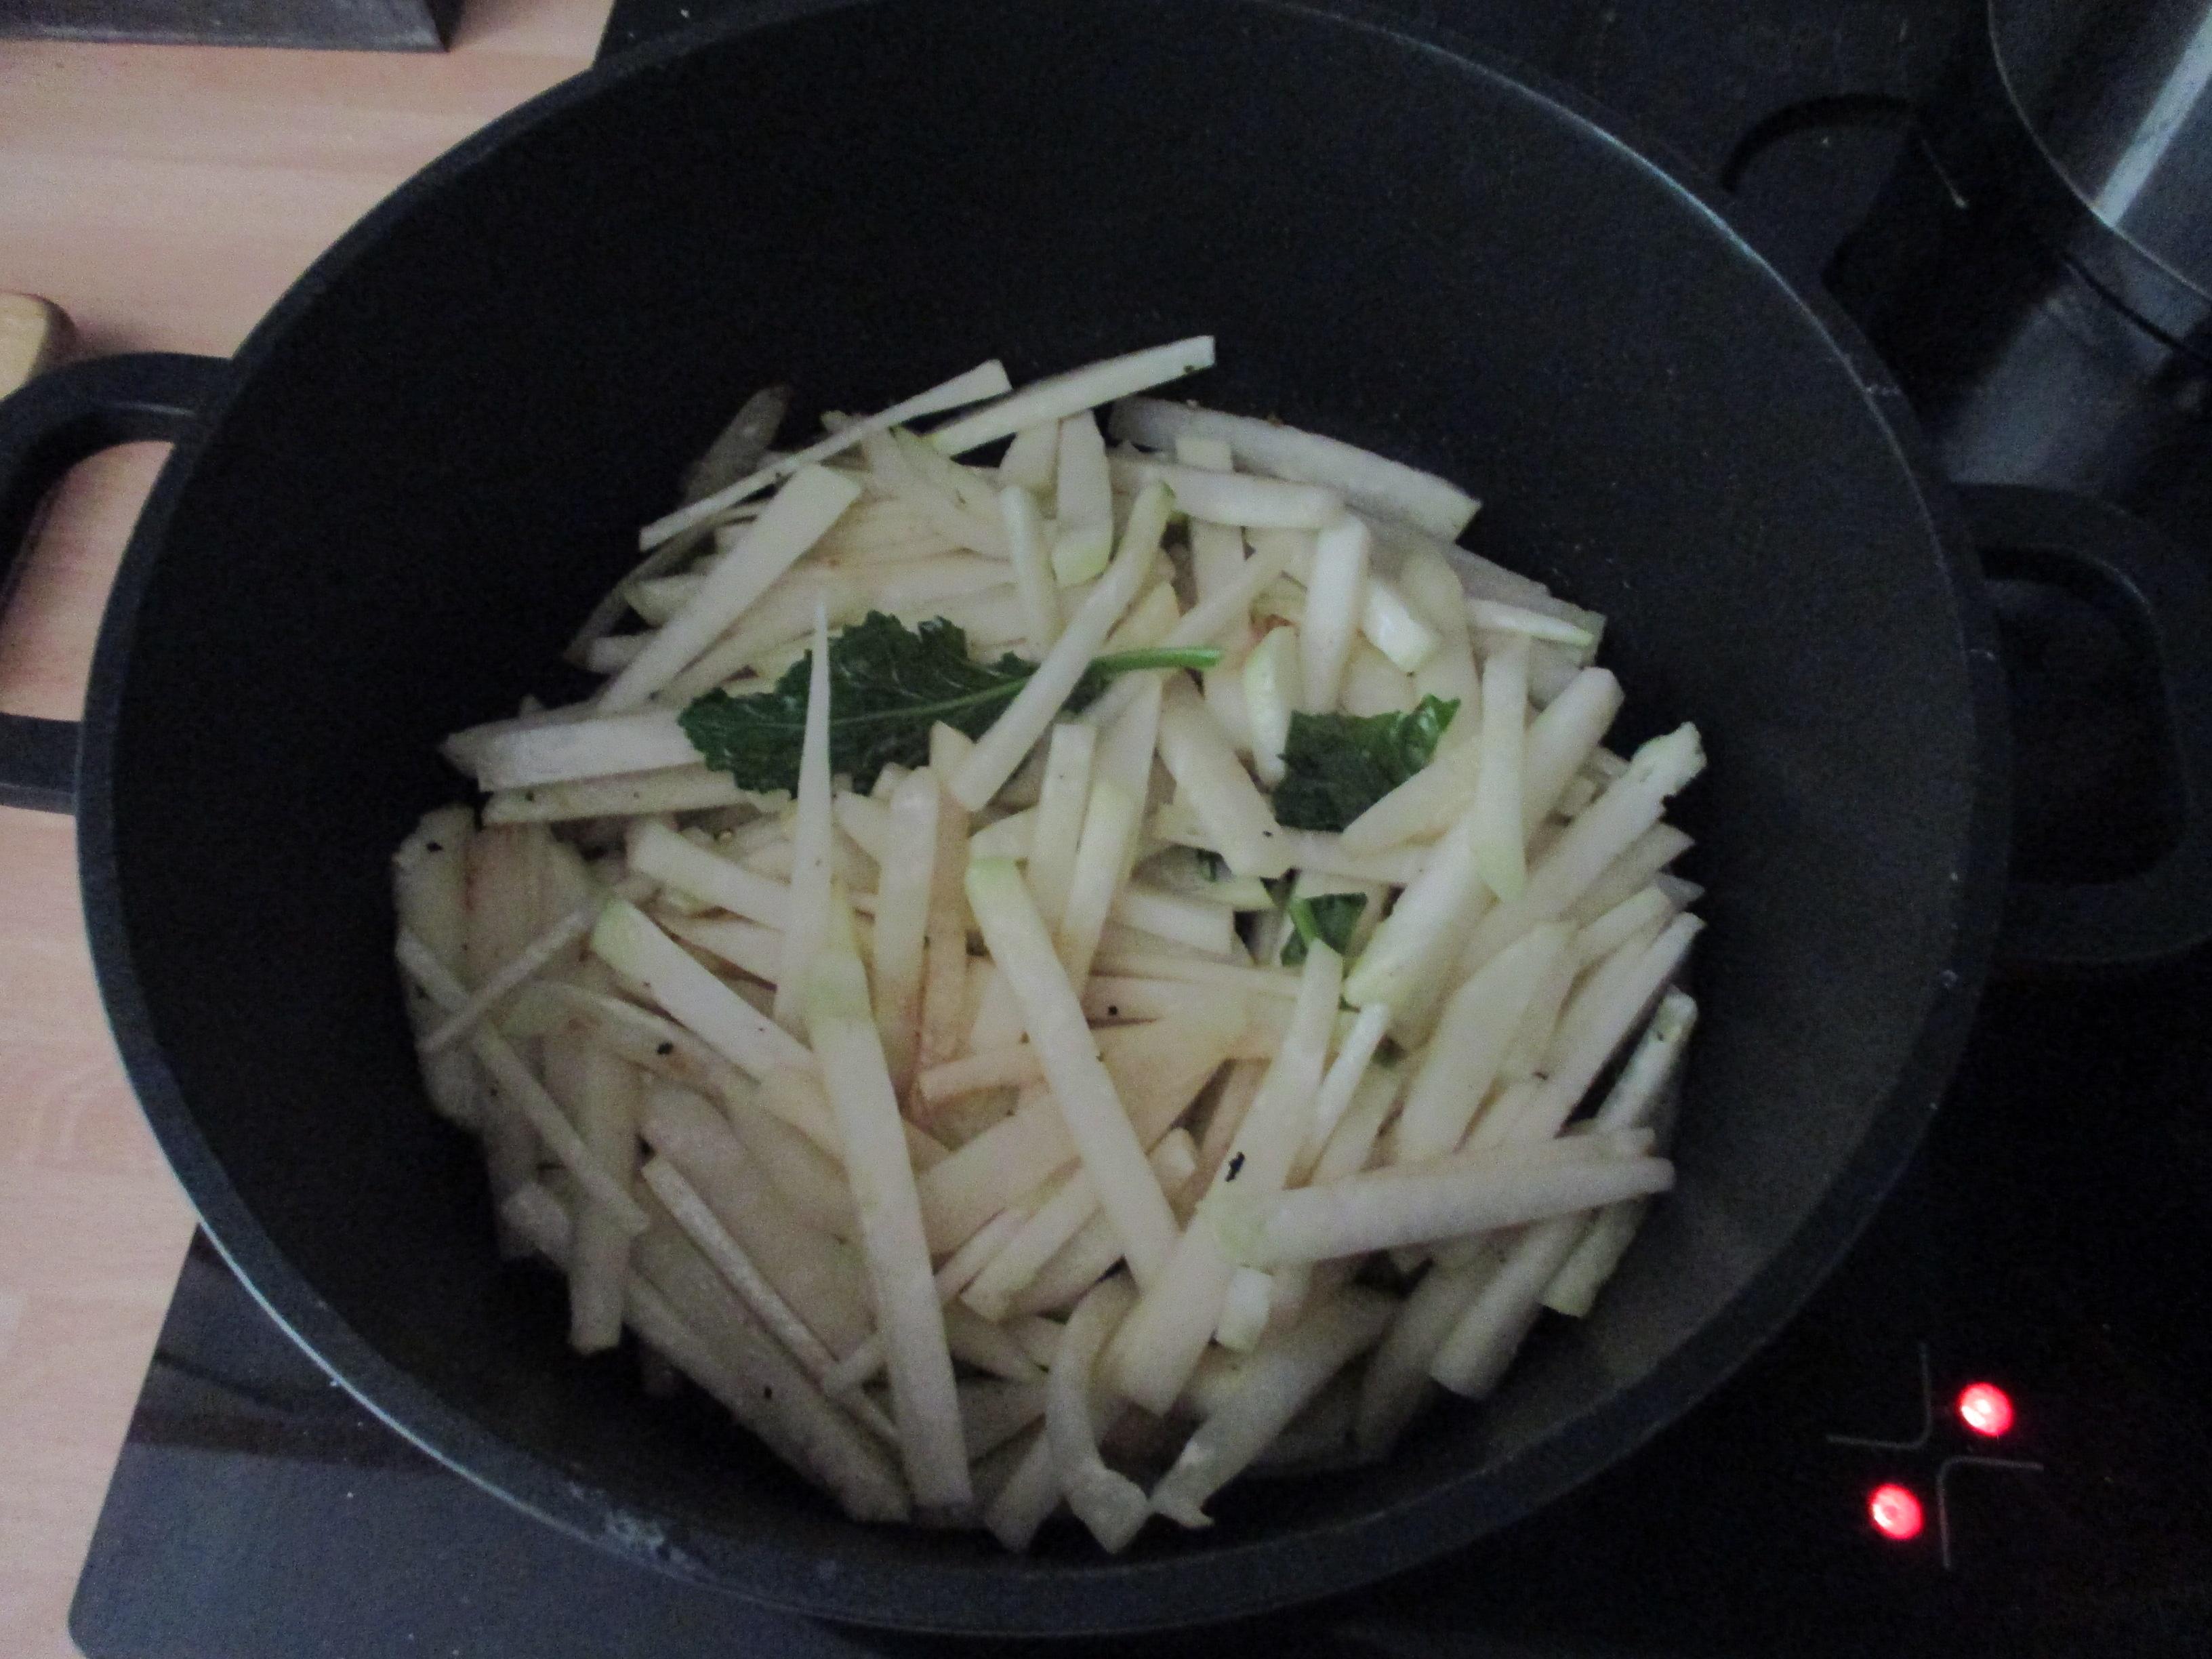 Kabeljau,Kohlrabigemüse,Salzkartoffeln,Salat -9.6.15   (4)